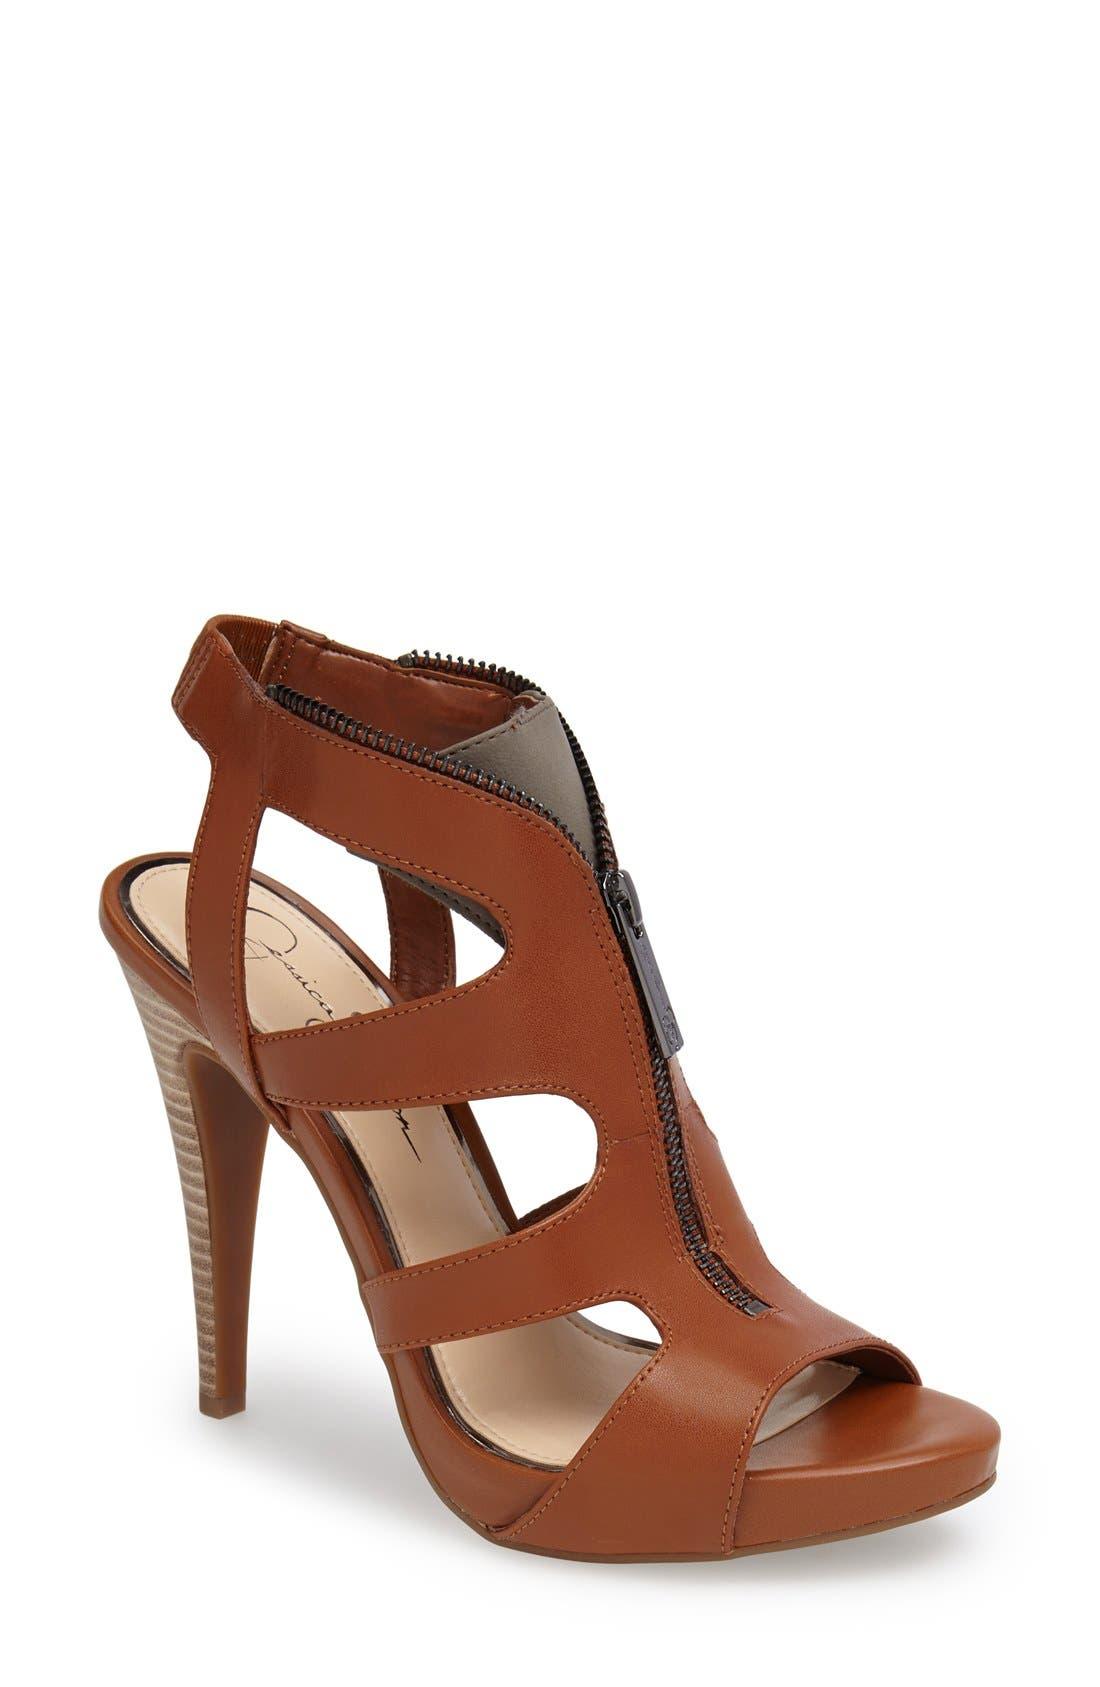 Alternate Image 1 Selected - Jessica Simpson 'Carmyne' Leather Sandal (Women)